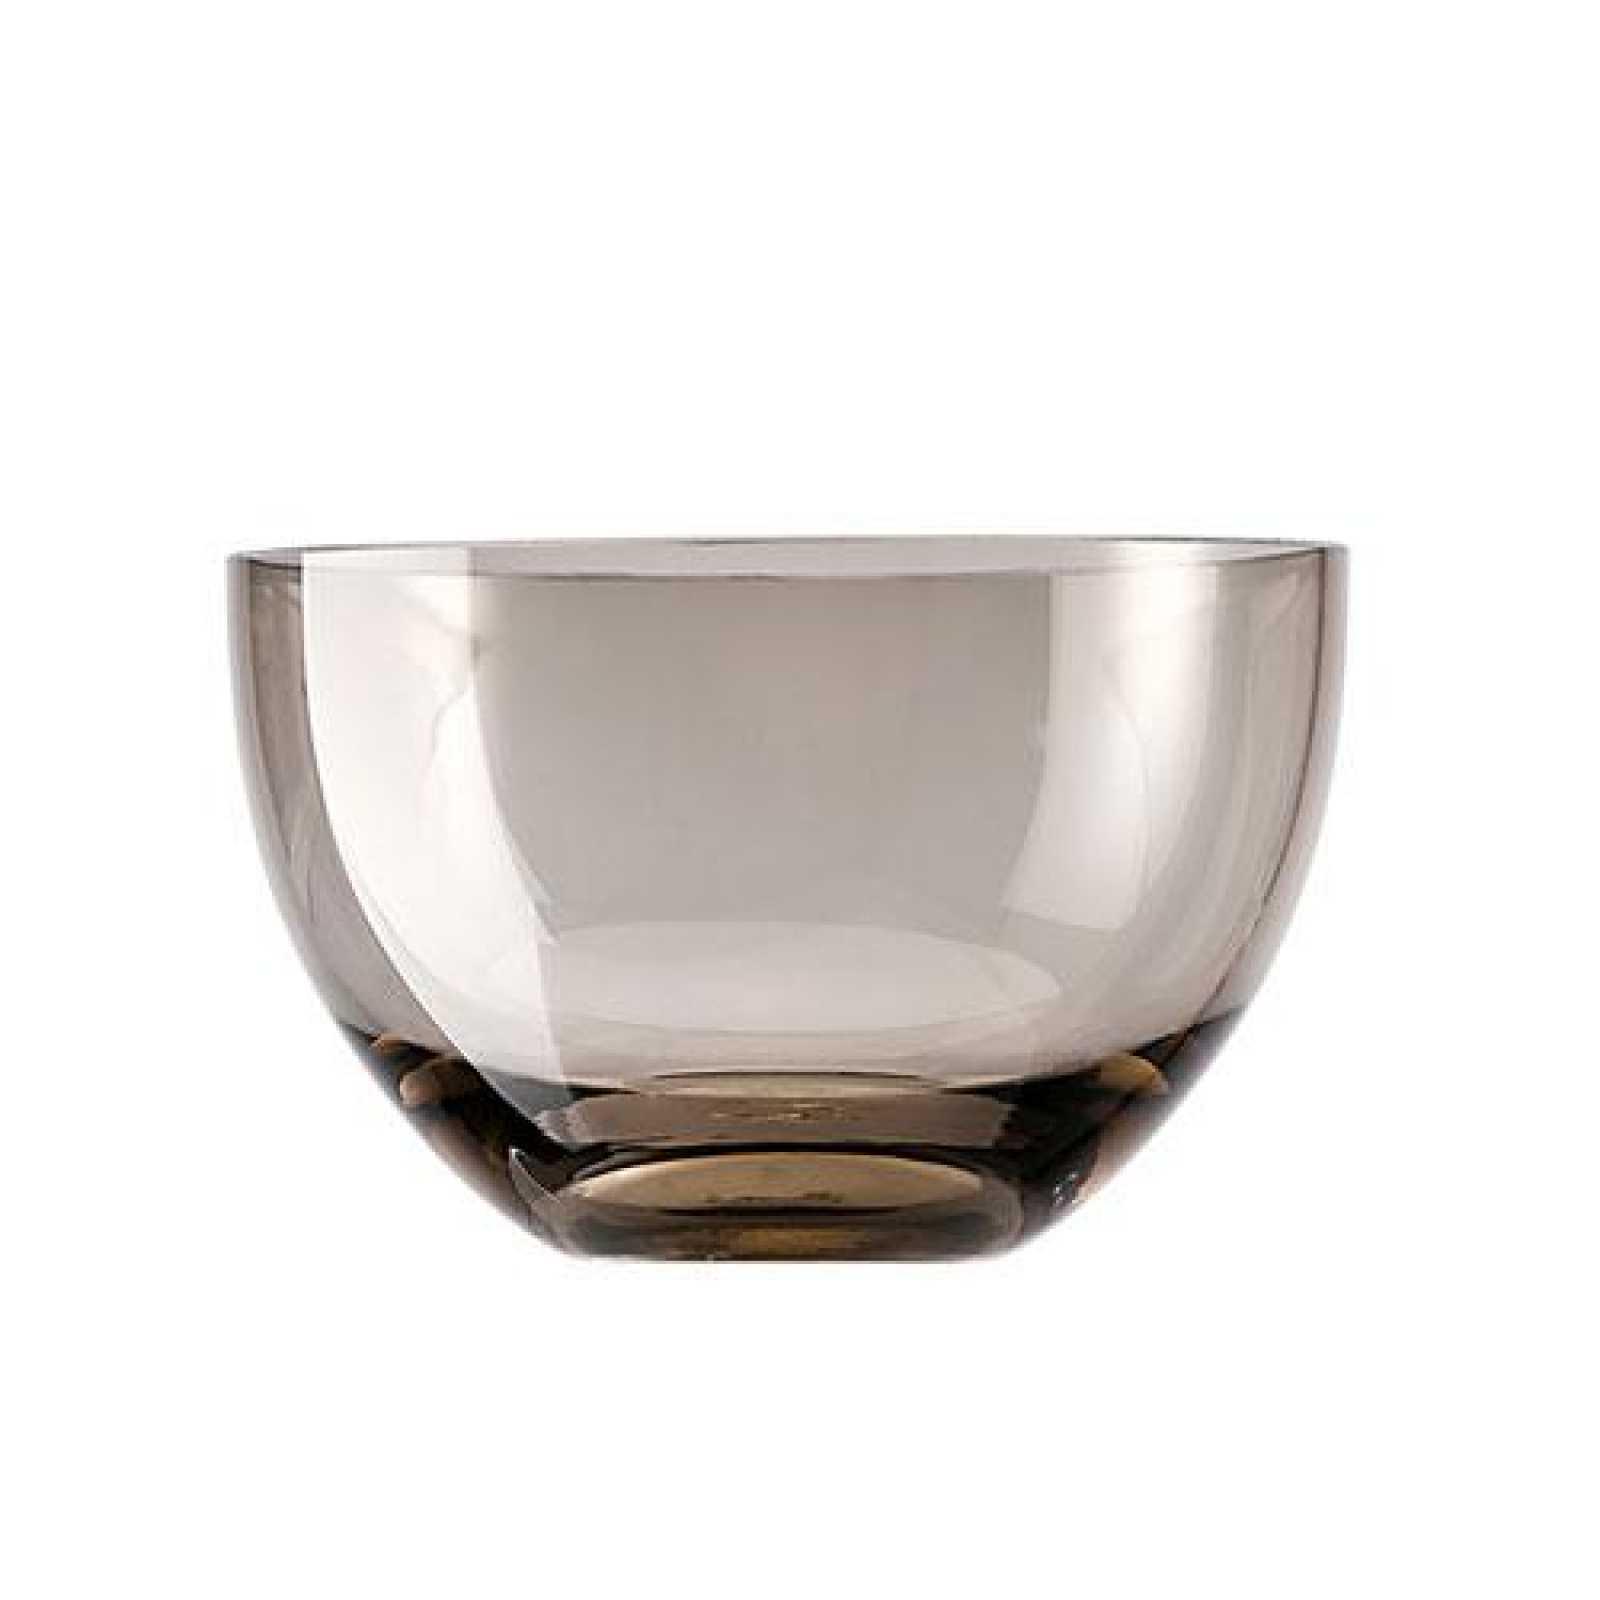 Онлайн каталог PROMENU: Пиала стеклянная Rosenthal SUNNY DAY, диаметр 12 см, коричневый Rosenthal 69034-408526-45312